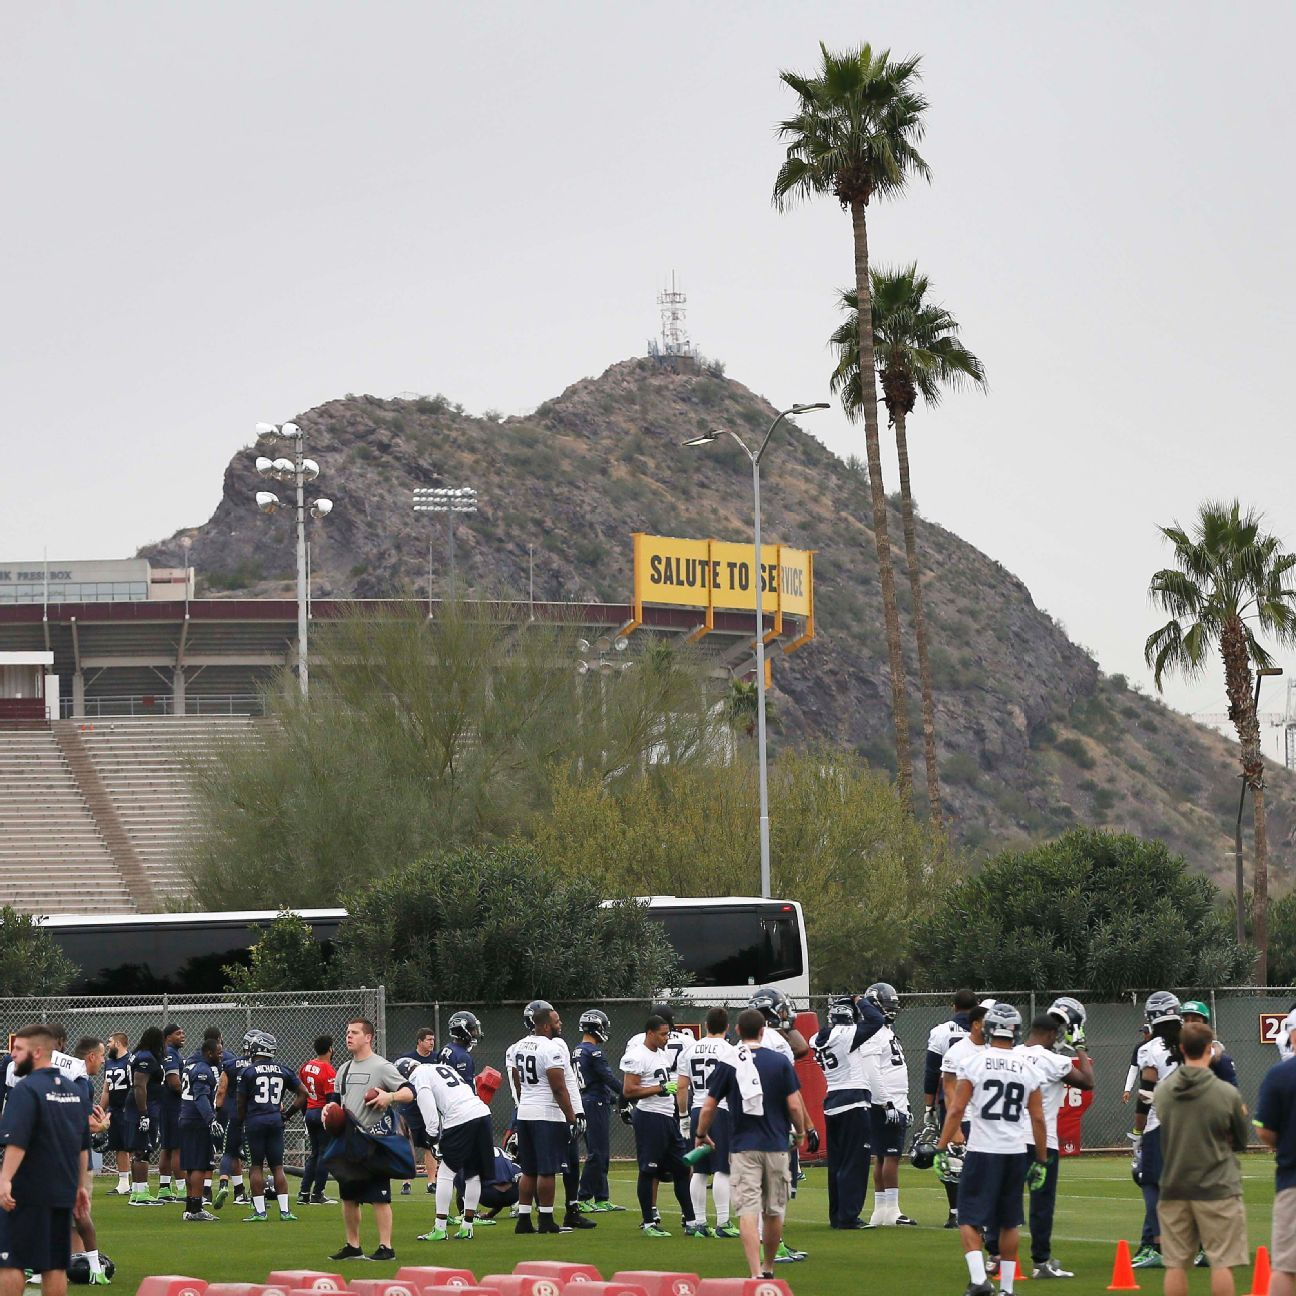 seahawks vs packers spread giants and washington score